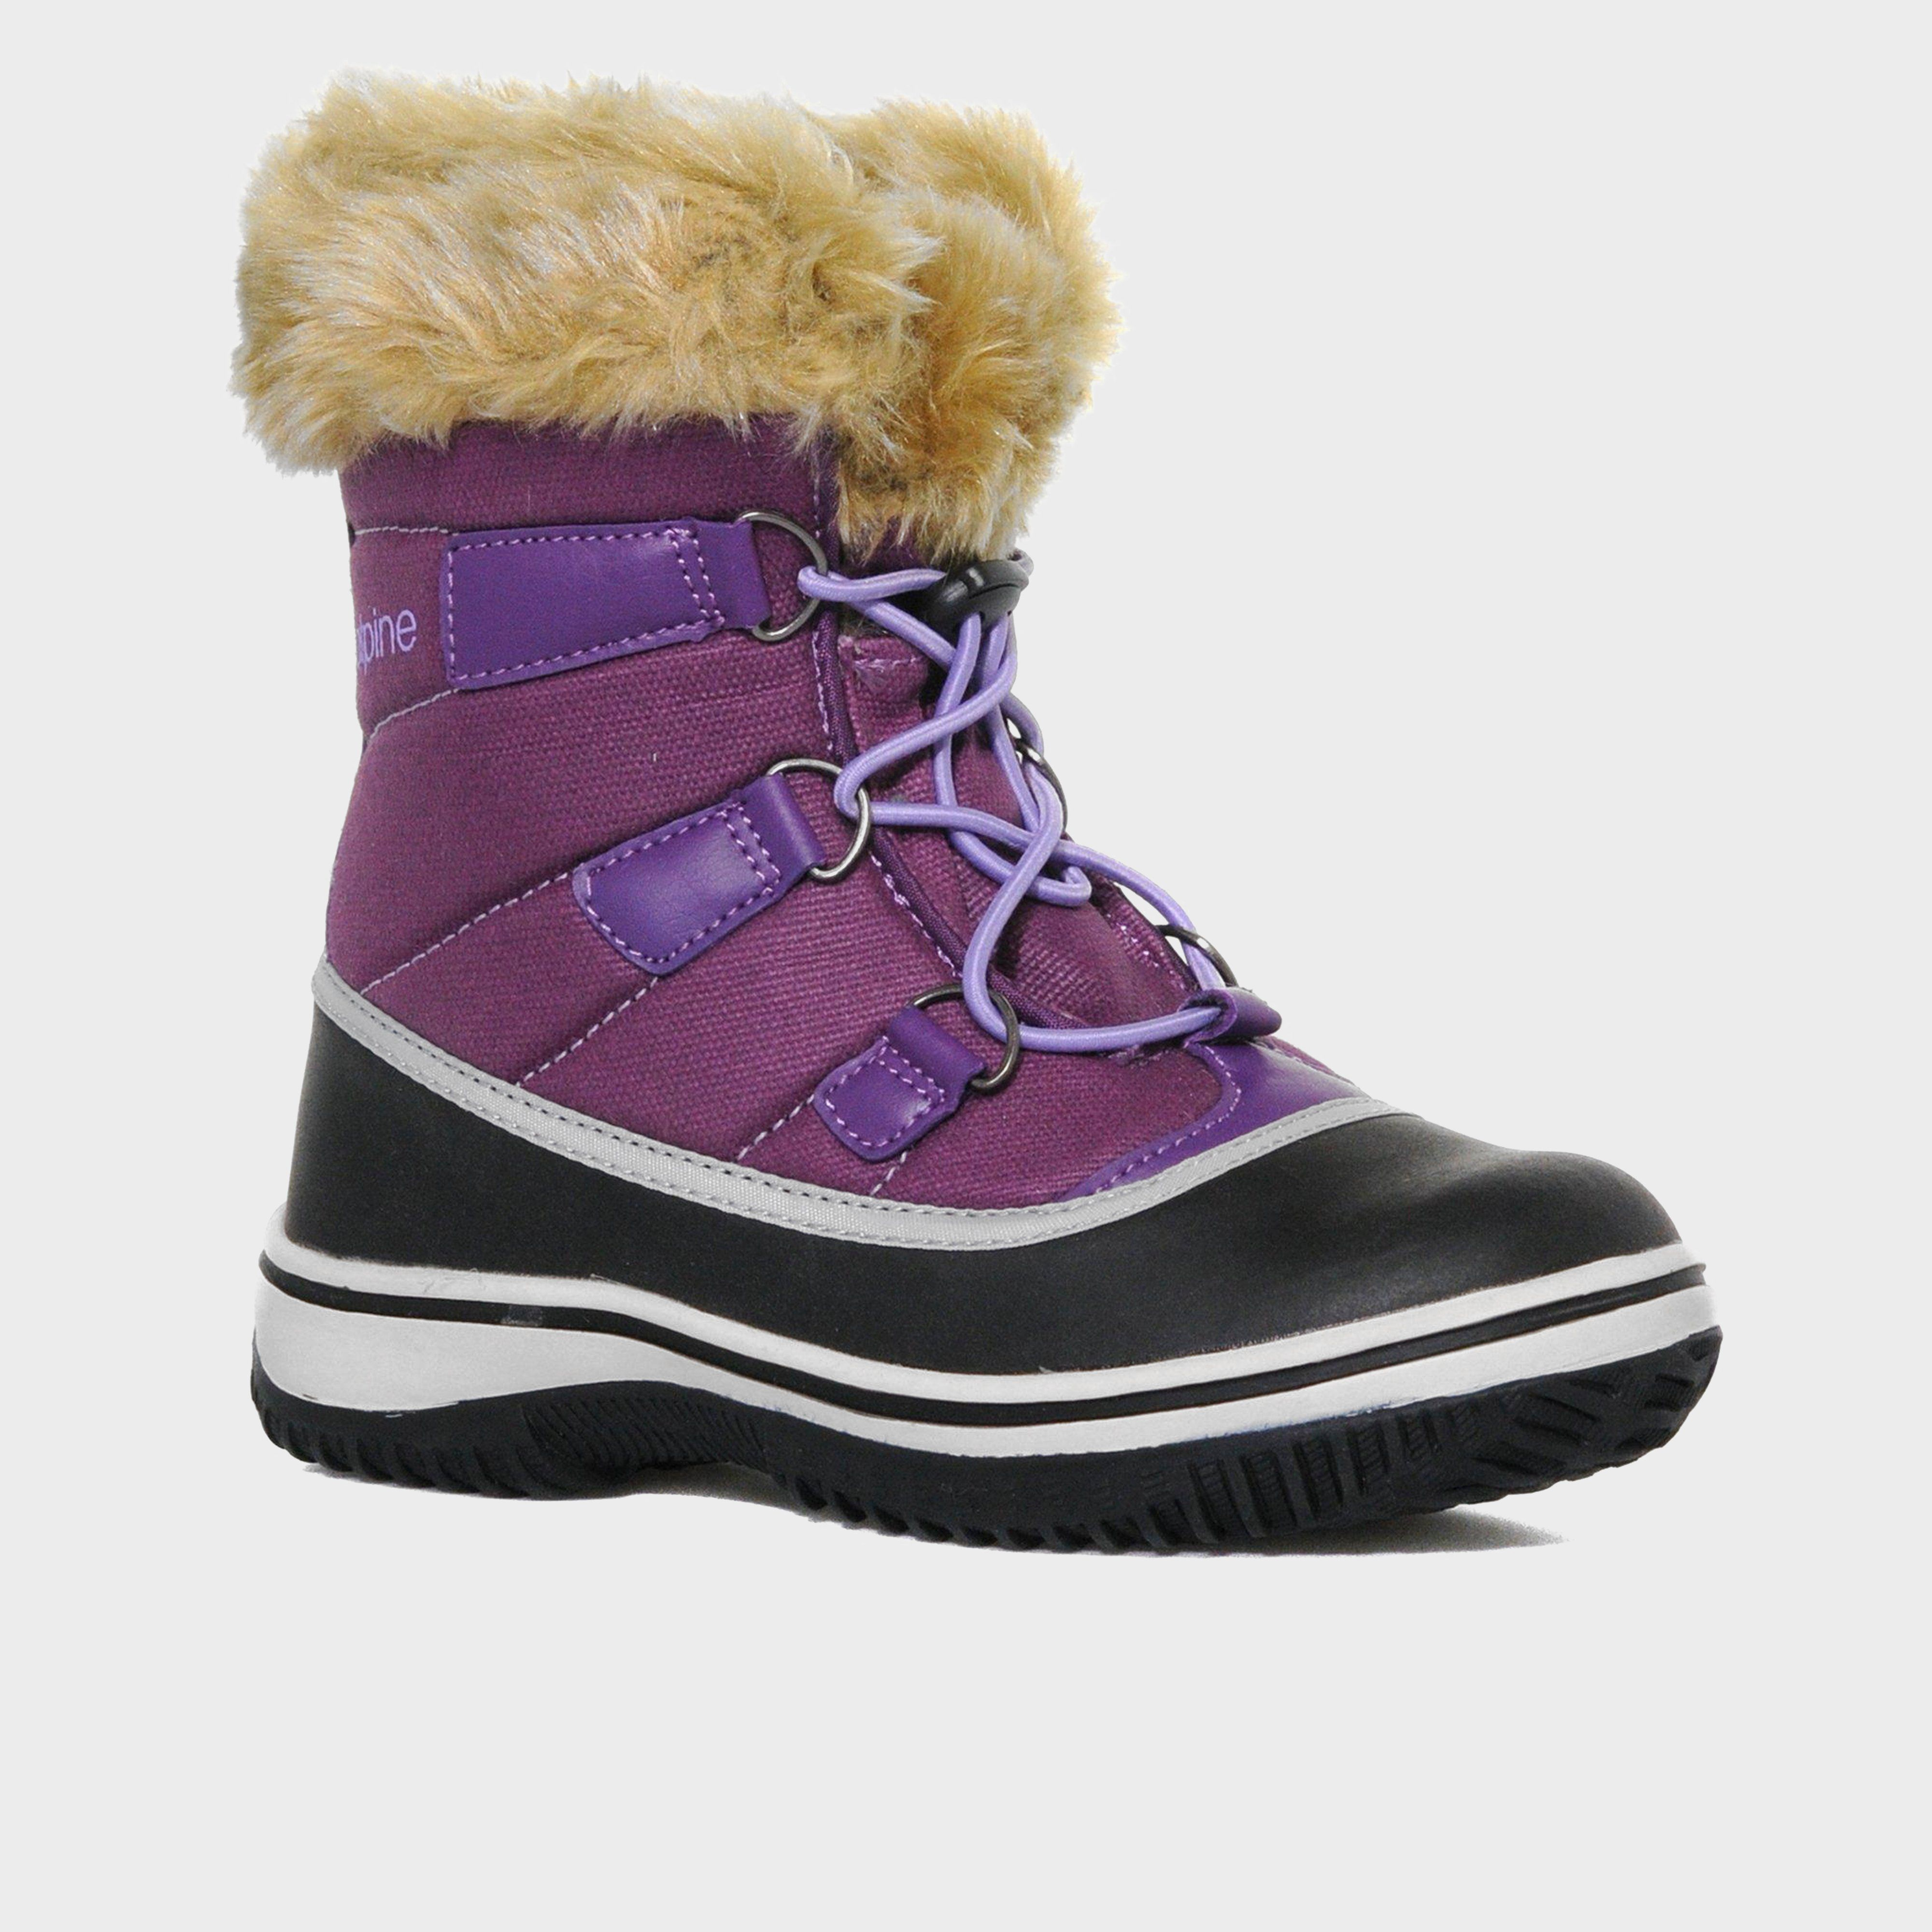 ALPINE Girls' Snow Boot